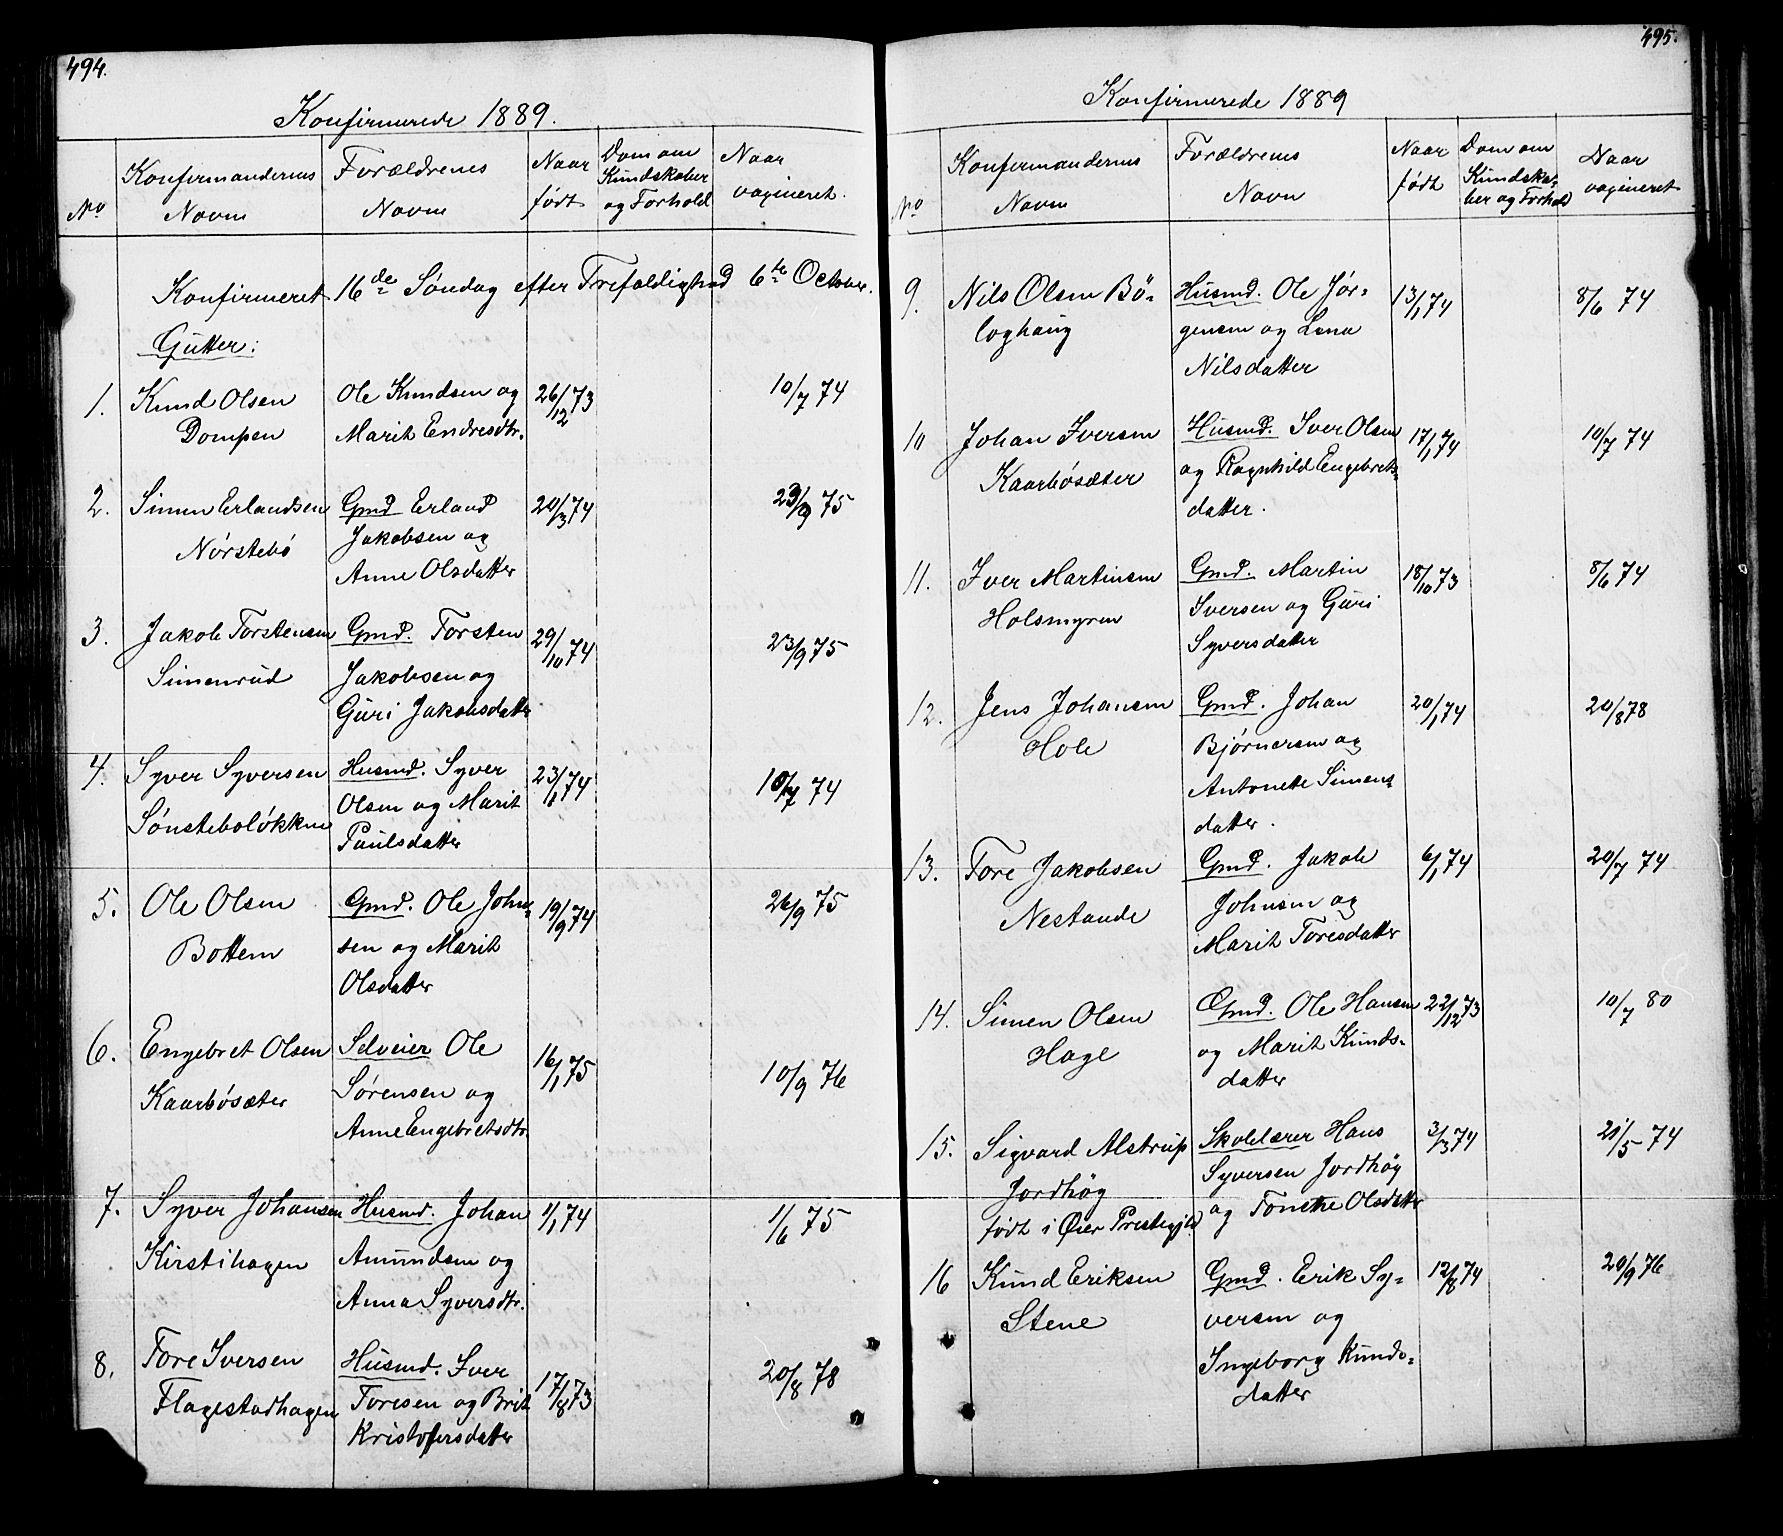 SAH, Lesja prestekontor, Klokkerbok nr. 5, 1850-1894, s. 494-495